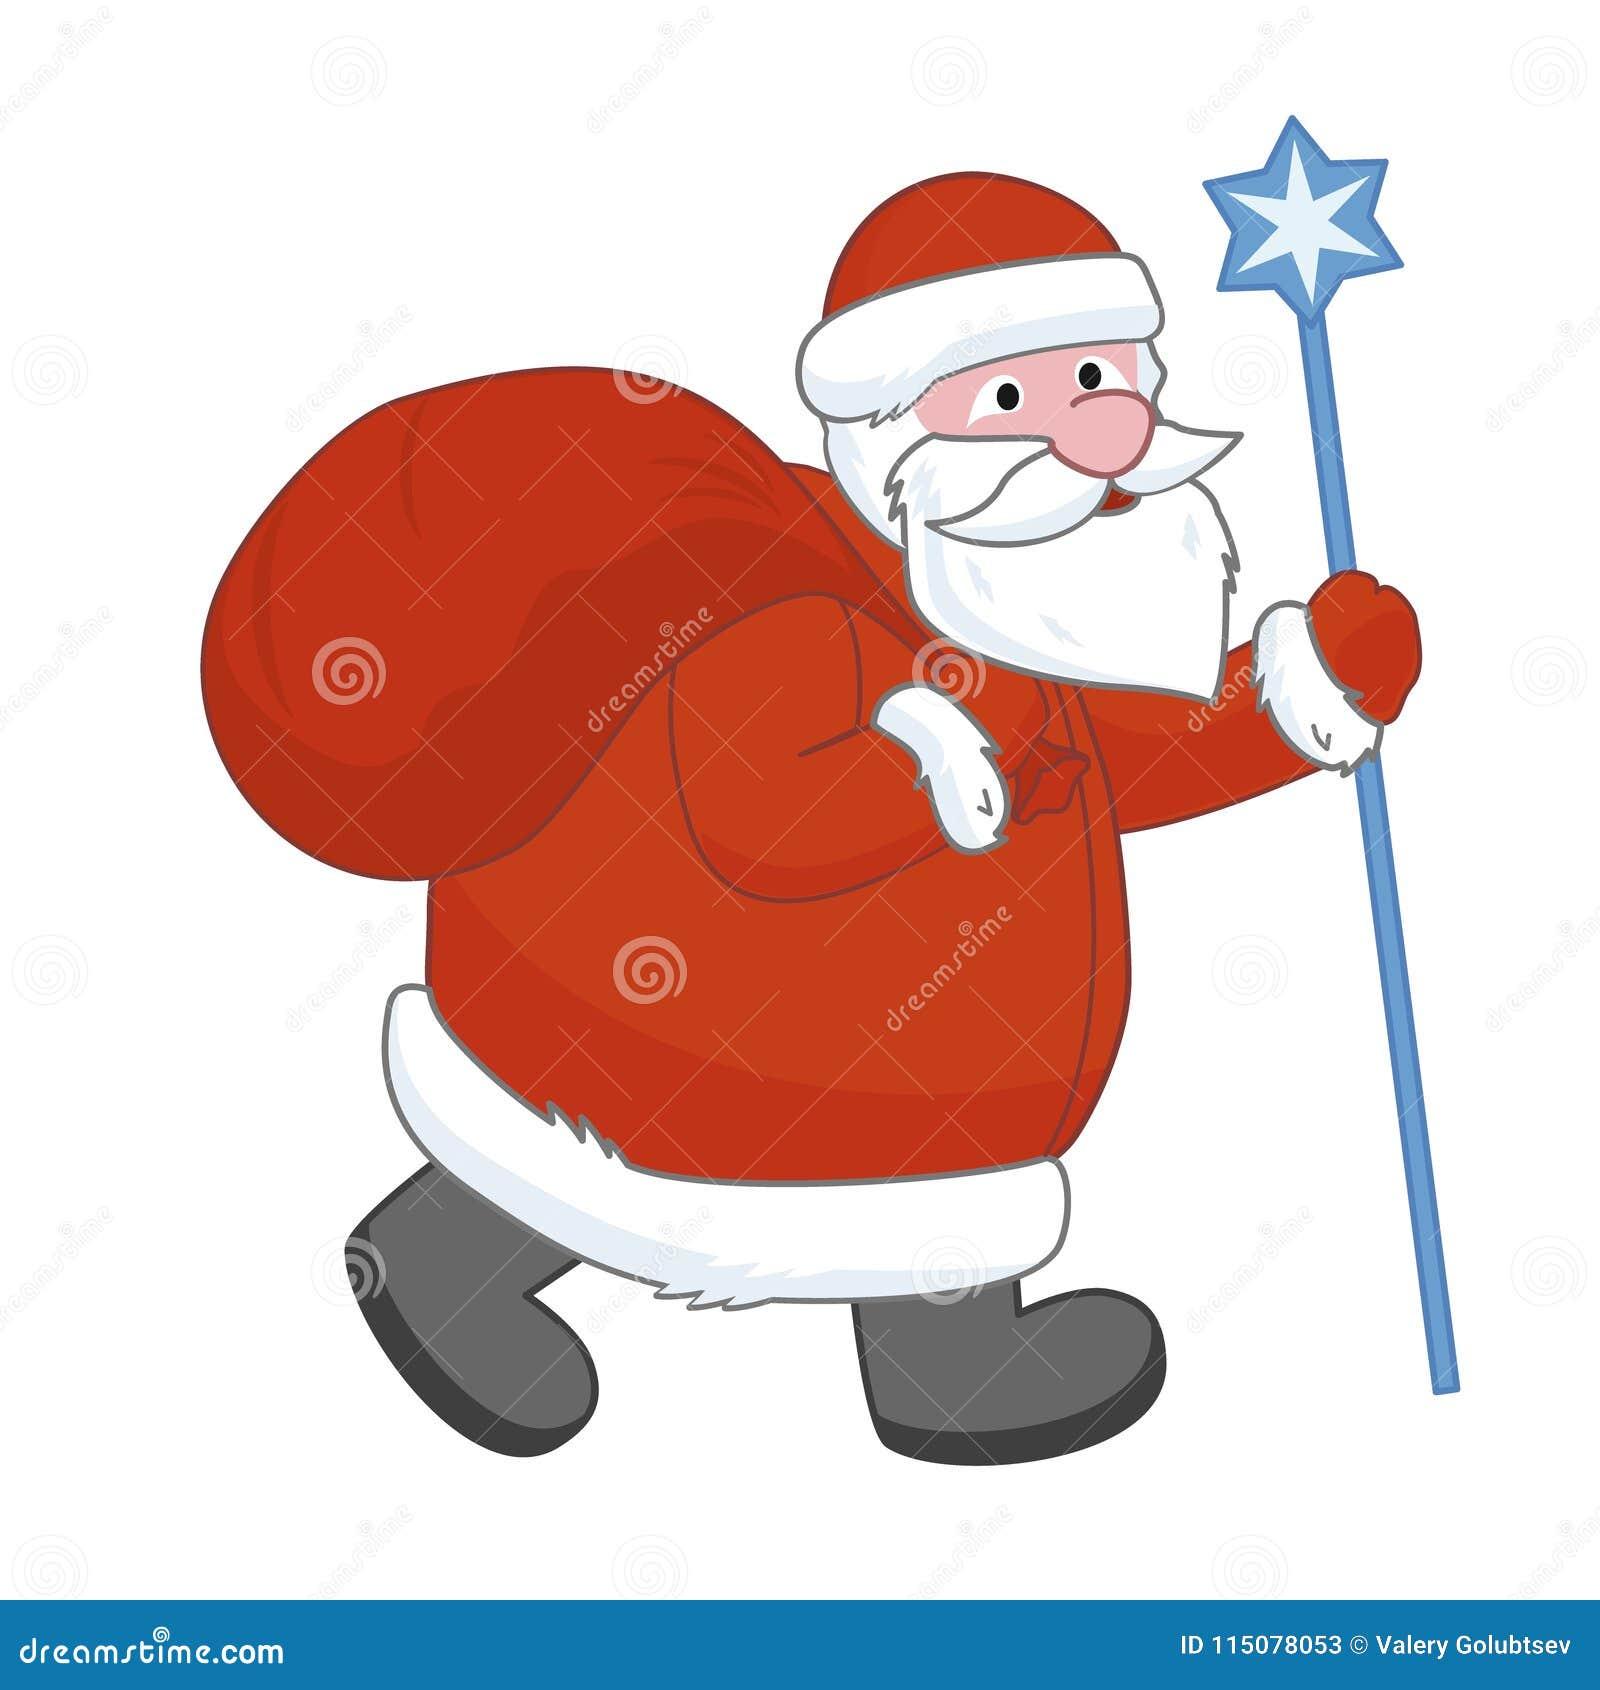 Santa Claus met een grote giftzak